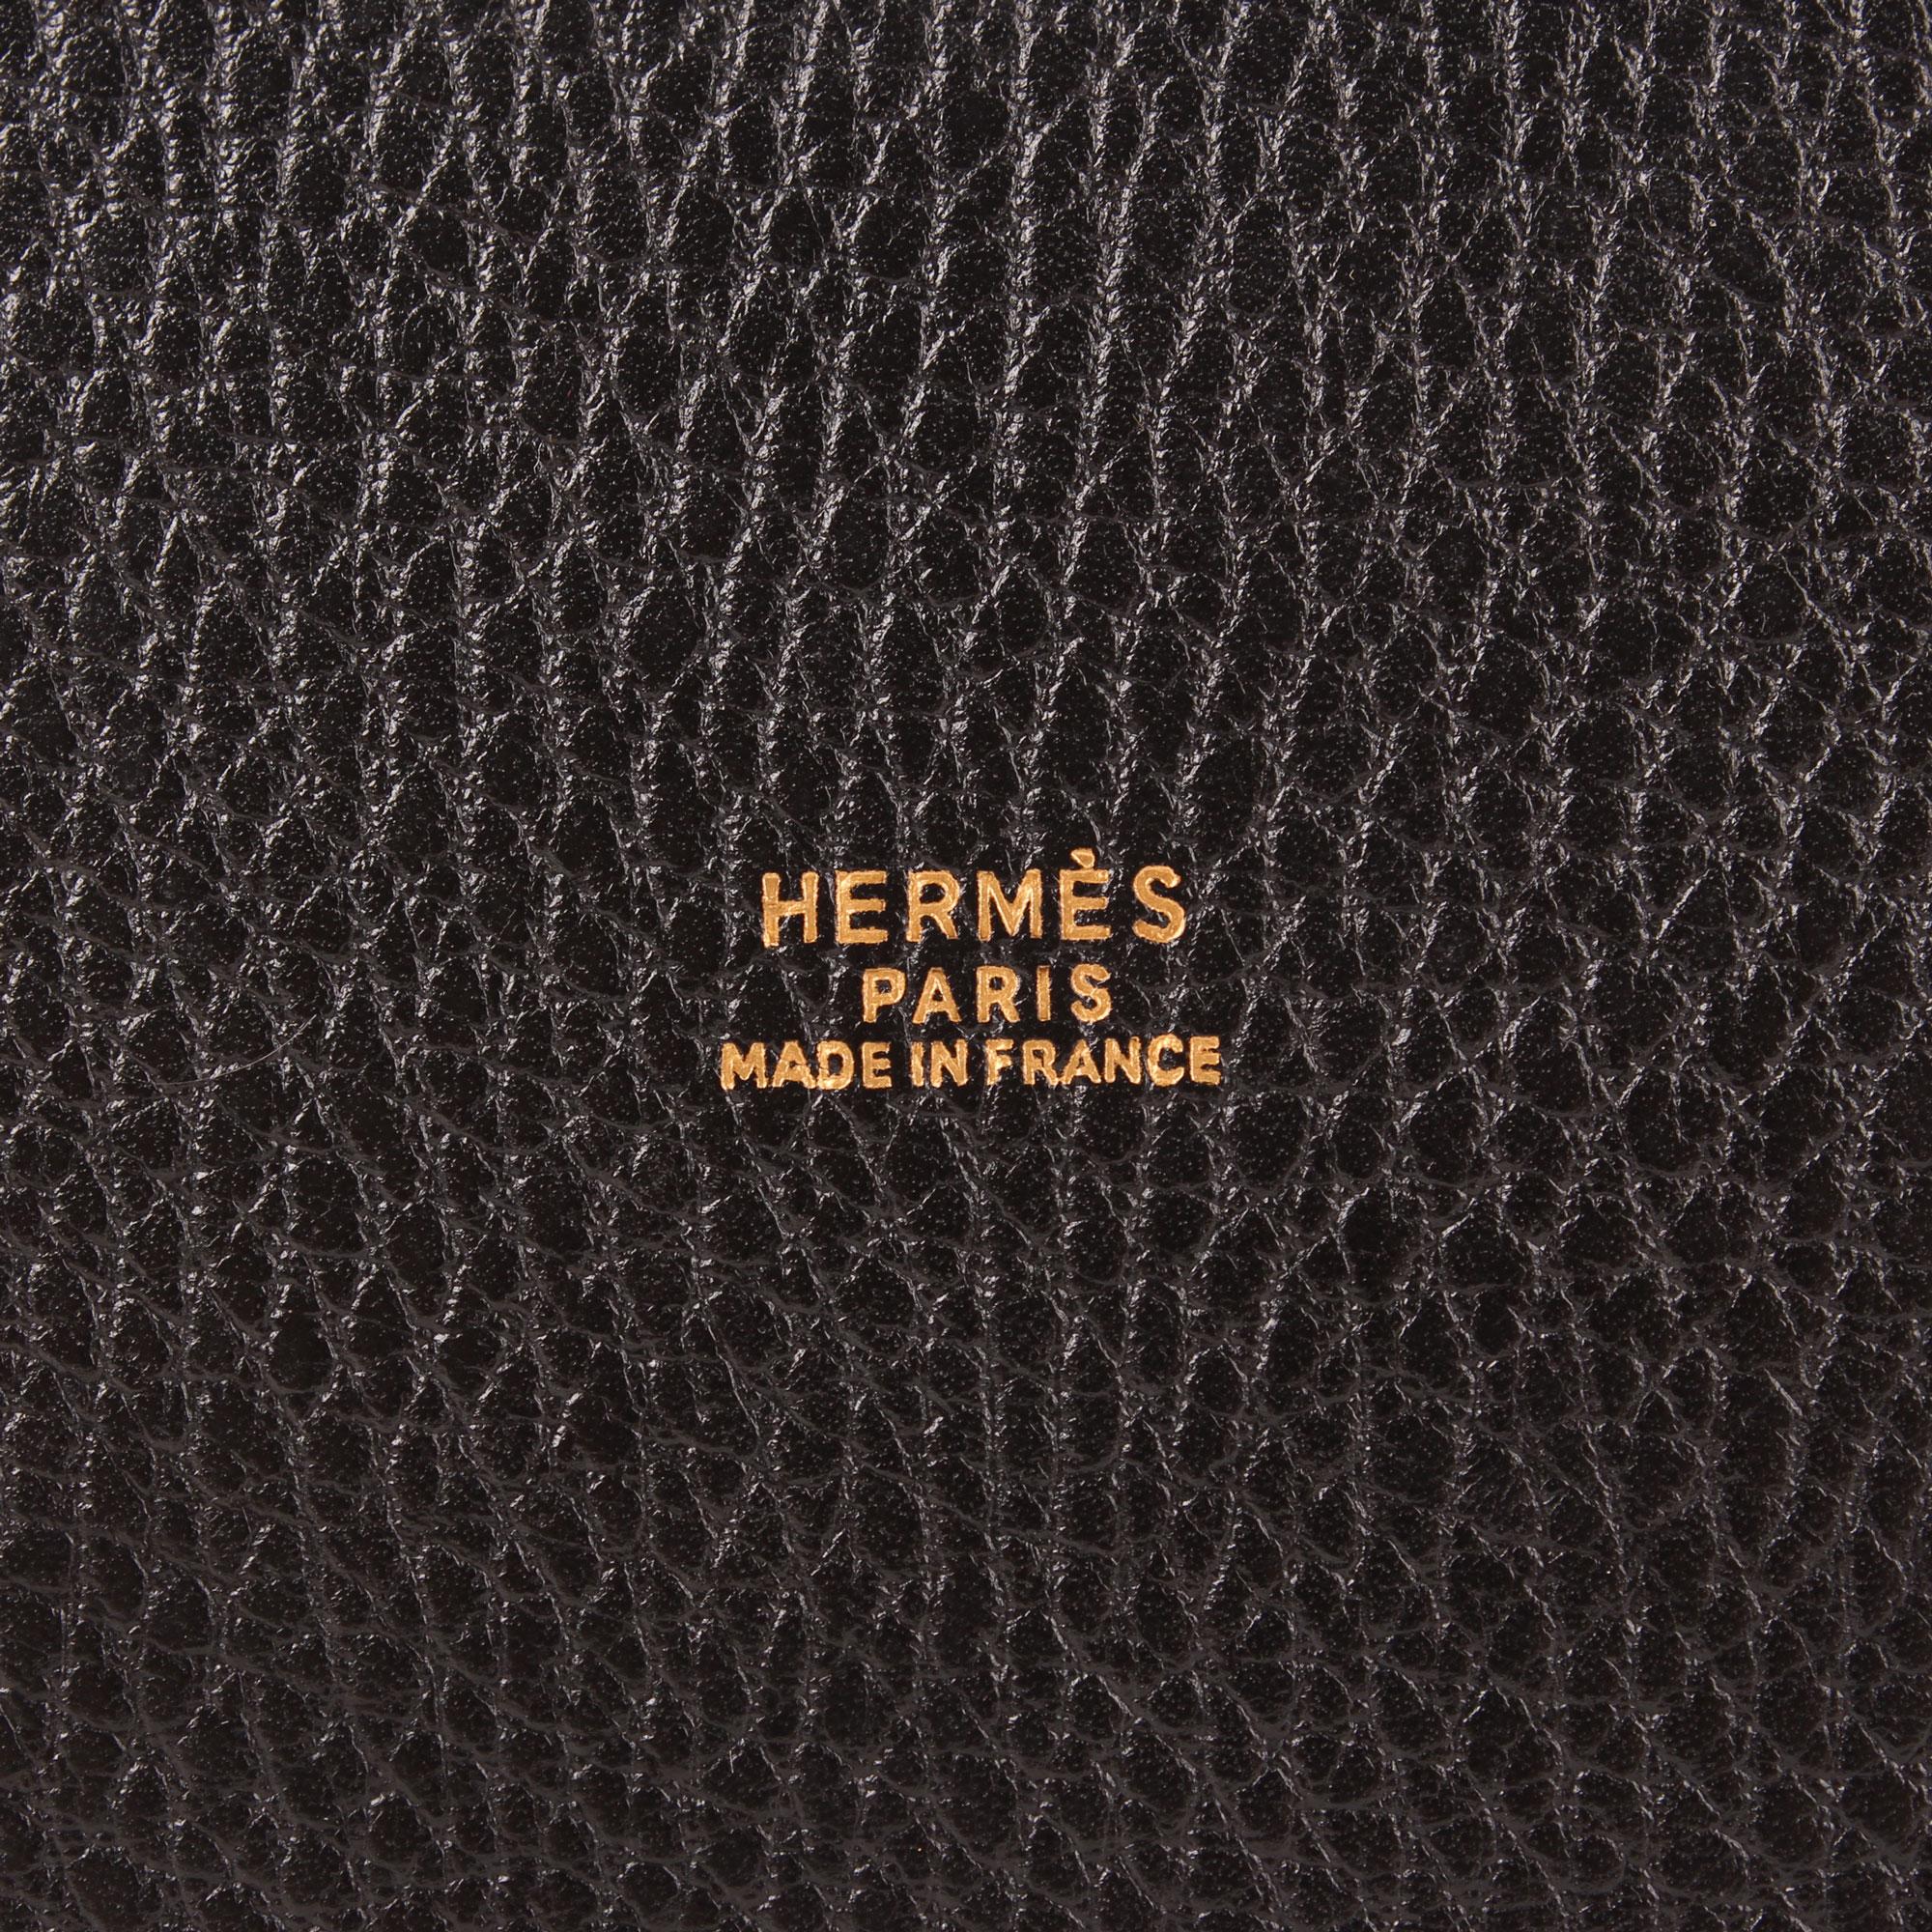 59fcdc0e2b7 Imagen de la marca del bolso hermès market bucket bag togo negro